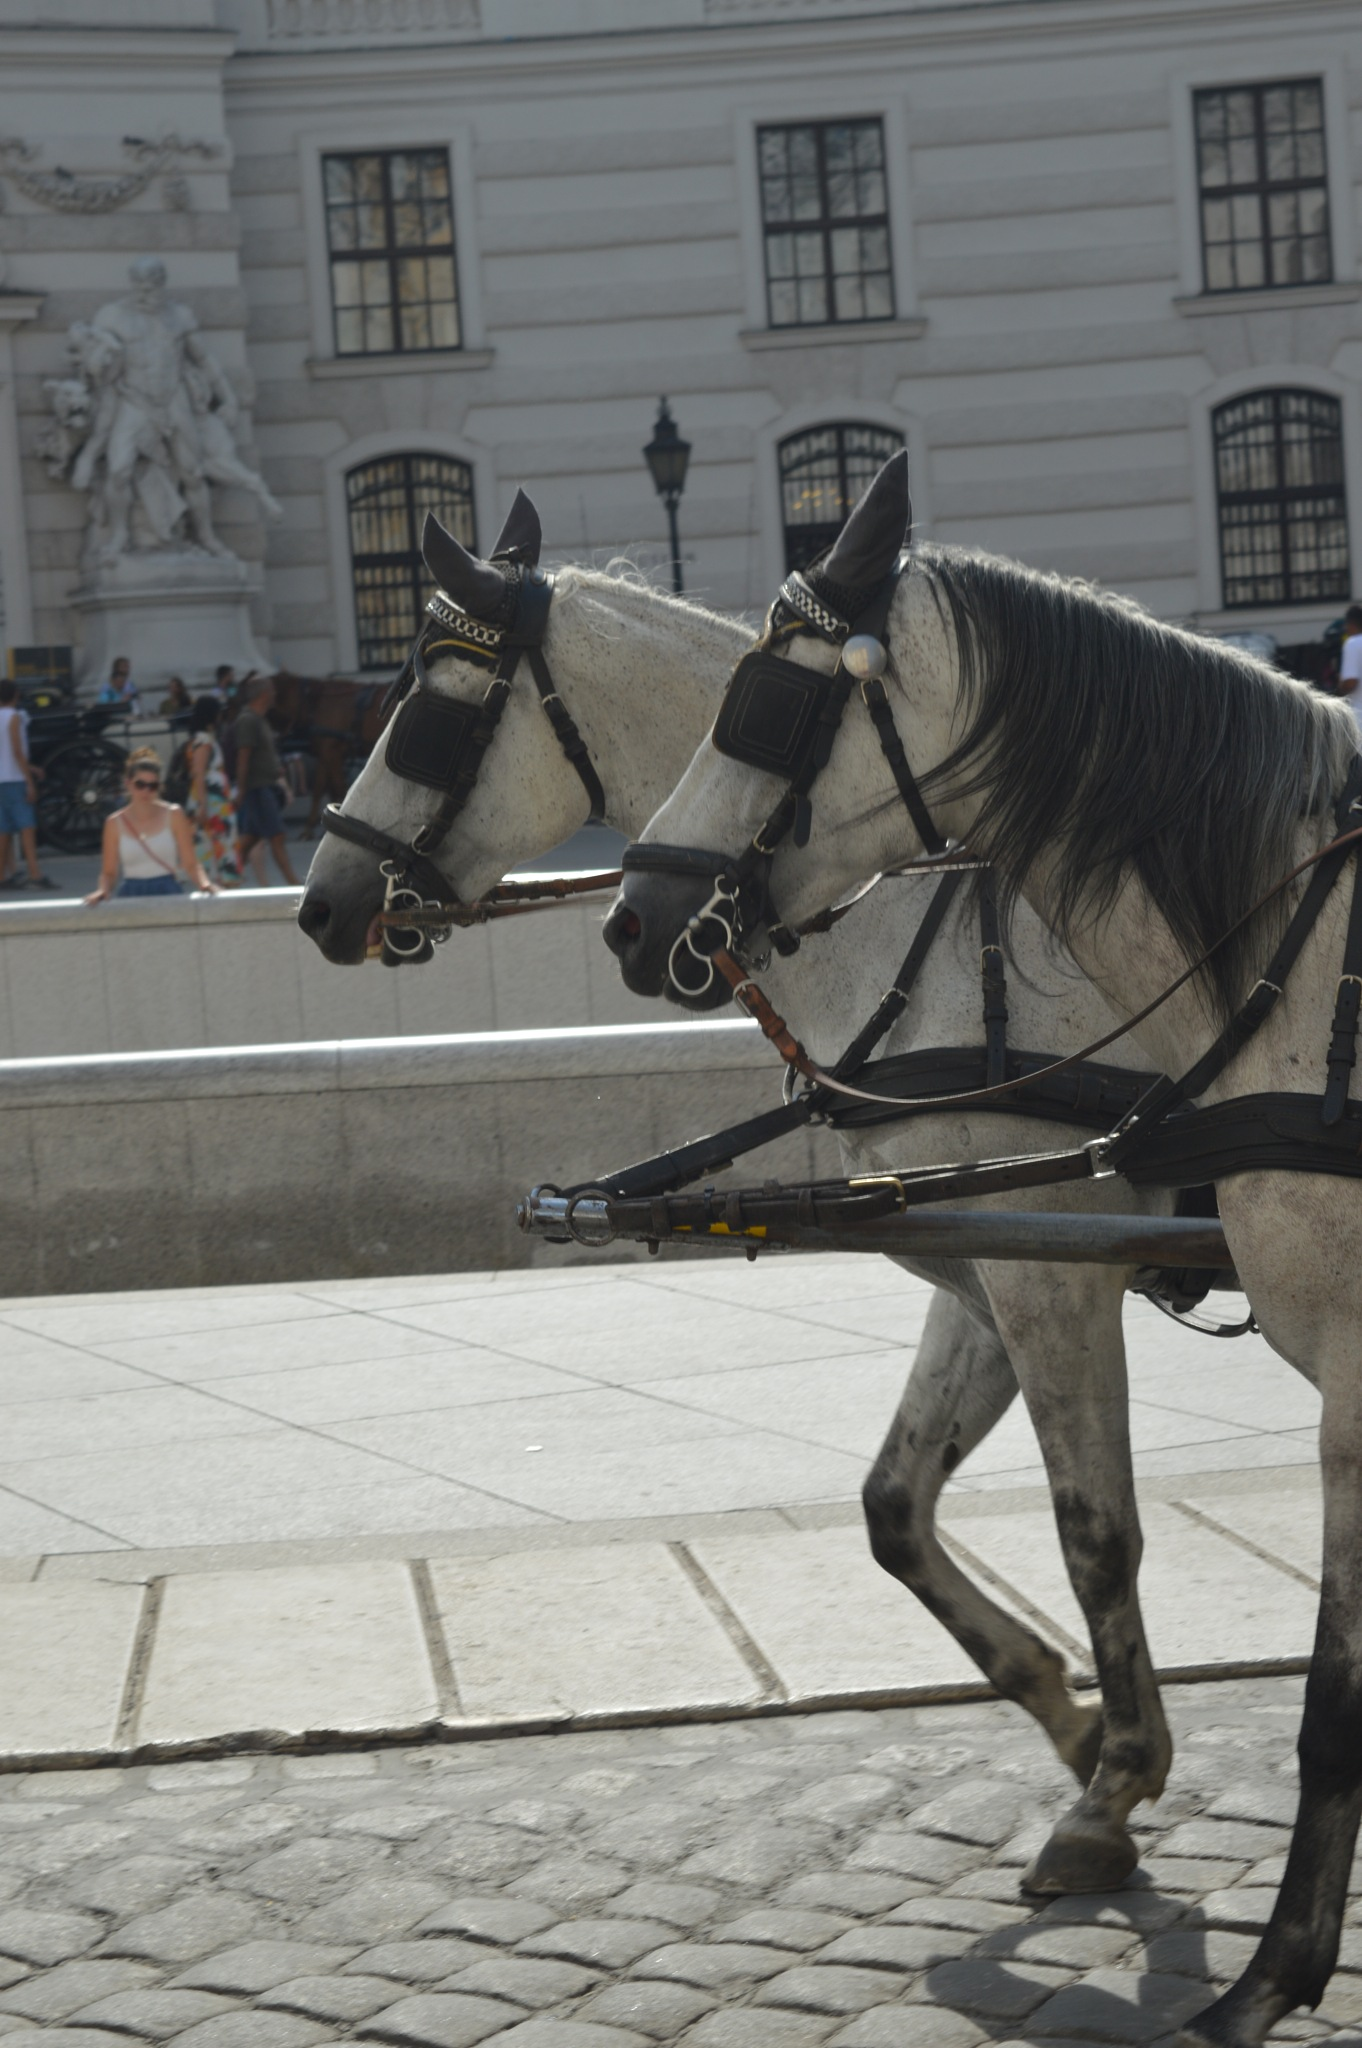 Horses in Vienna/Austria by Katharina Seiler